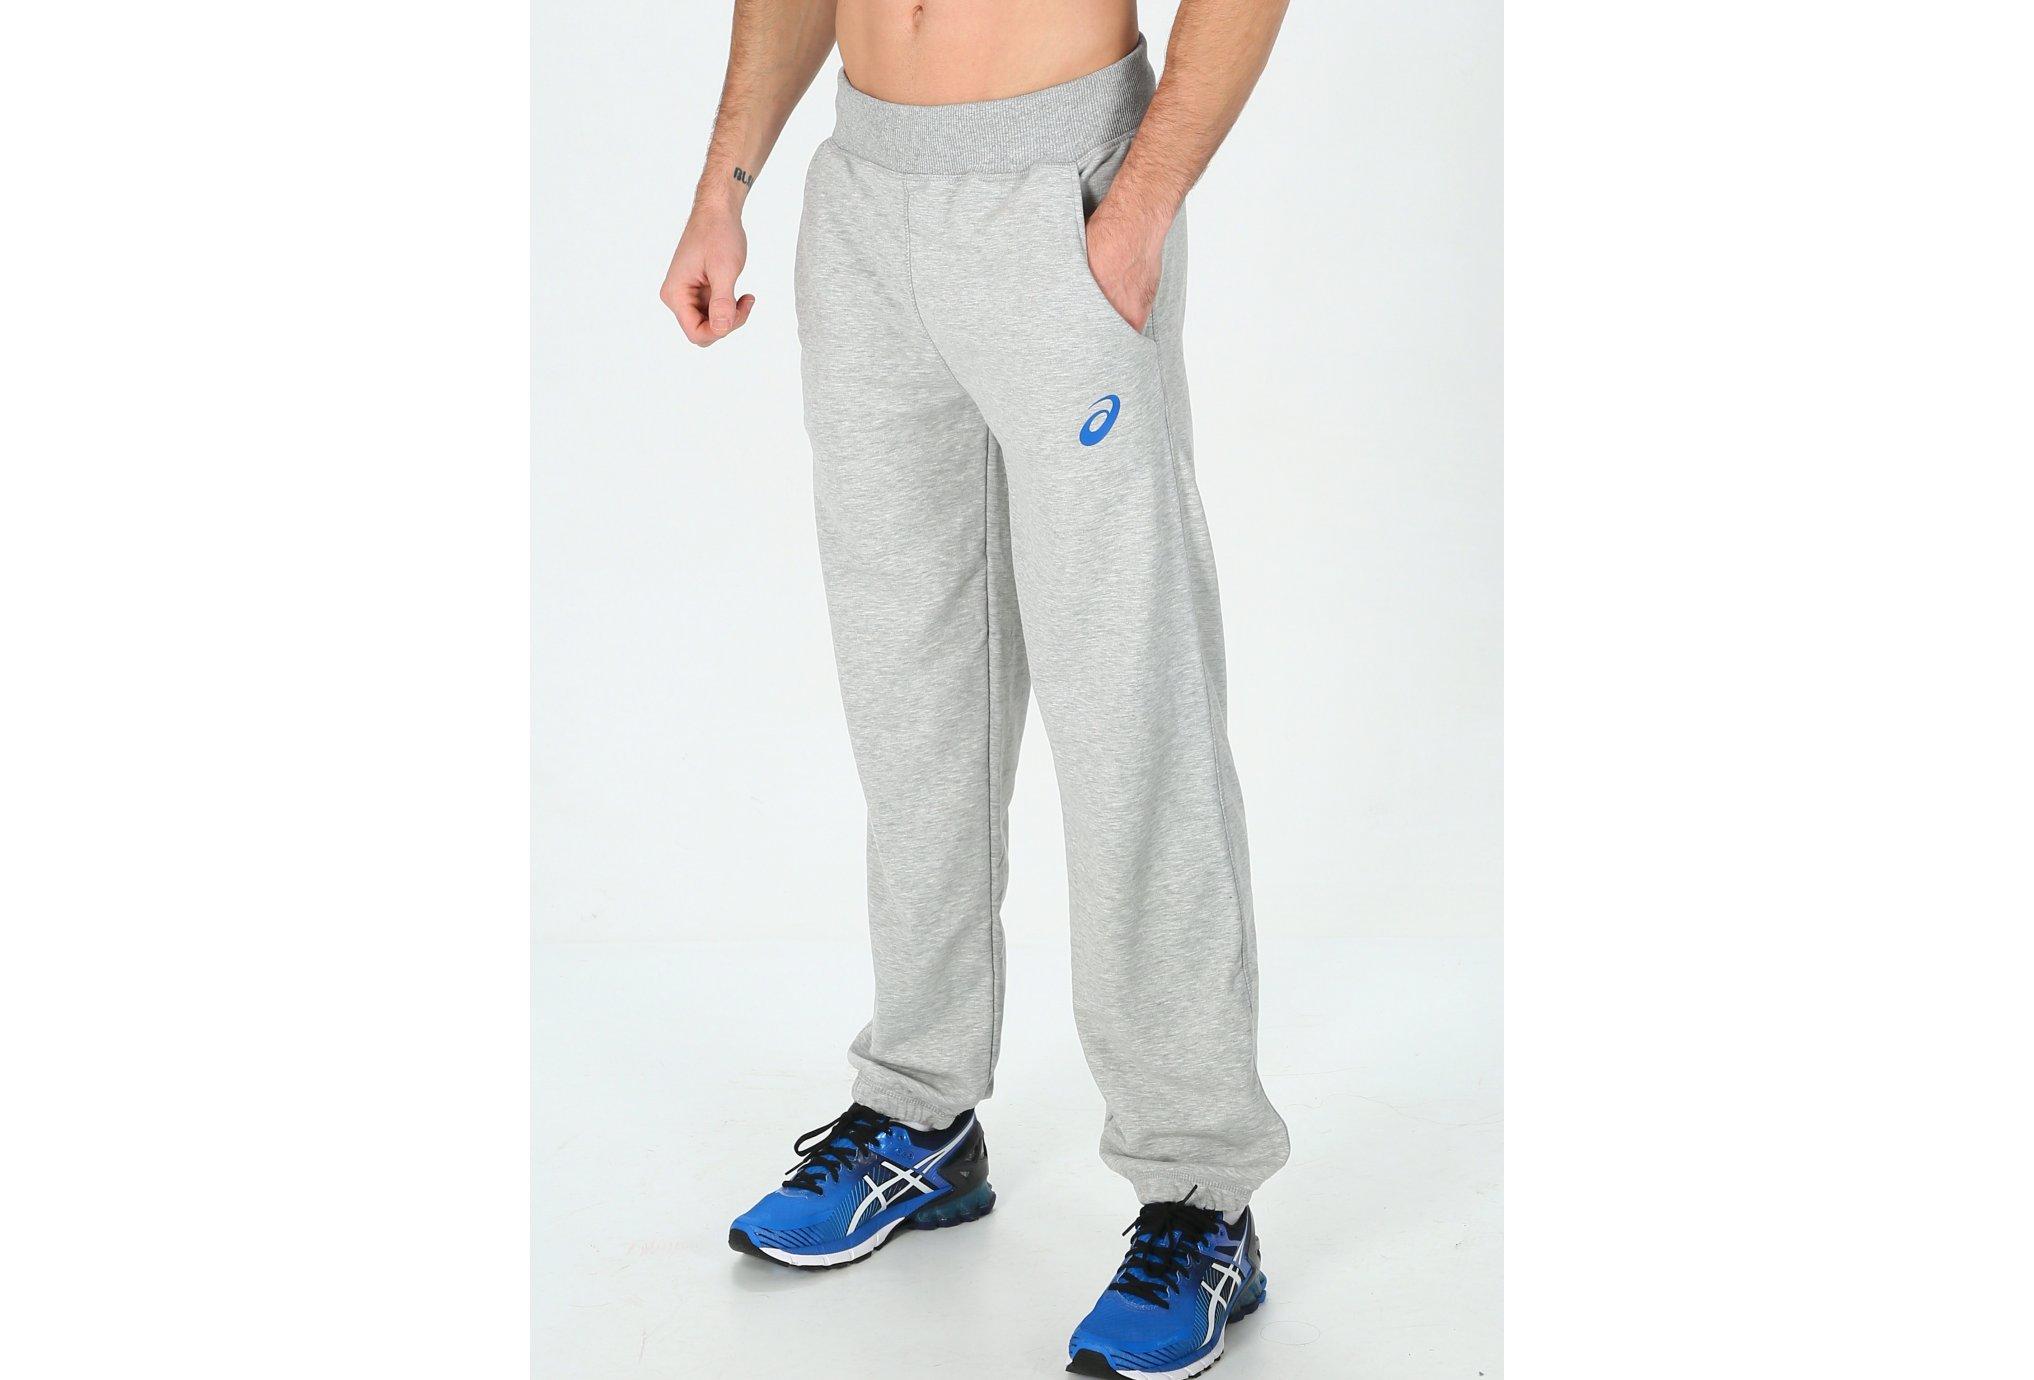 Asics Equipe de France Knit M vêtement running homme